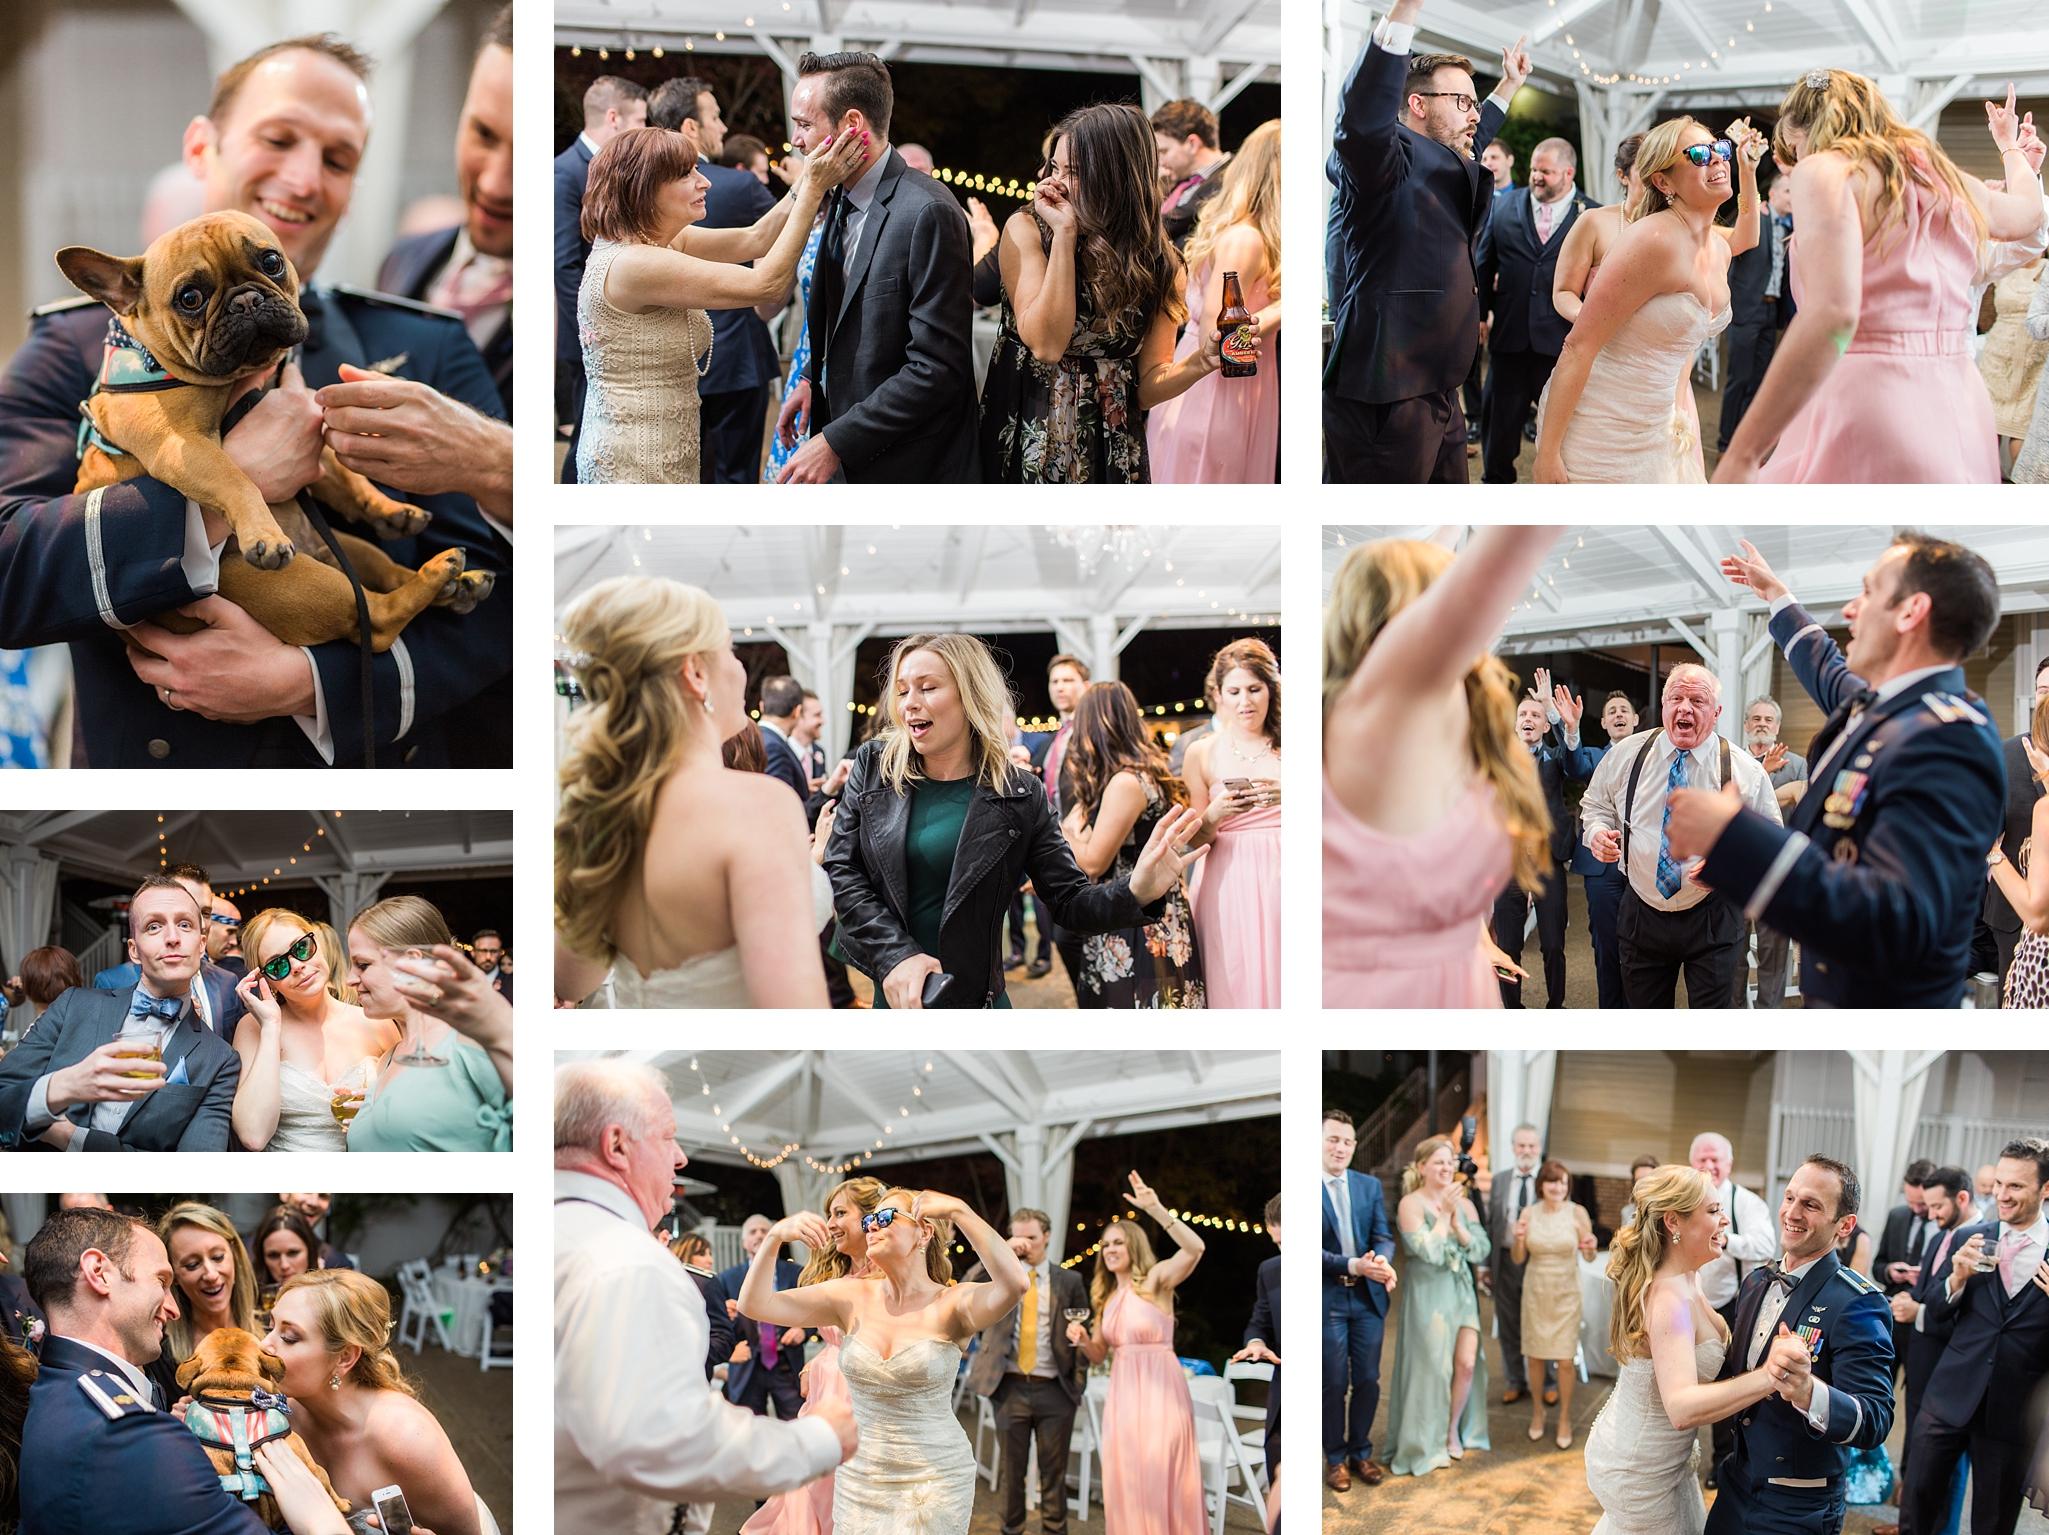 wedding-reception-at-cjs-tn.jpg